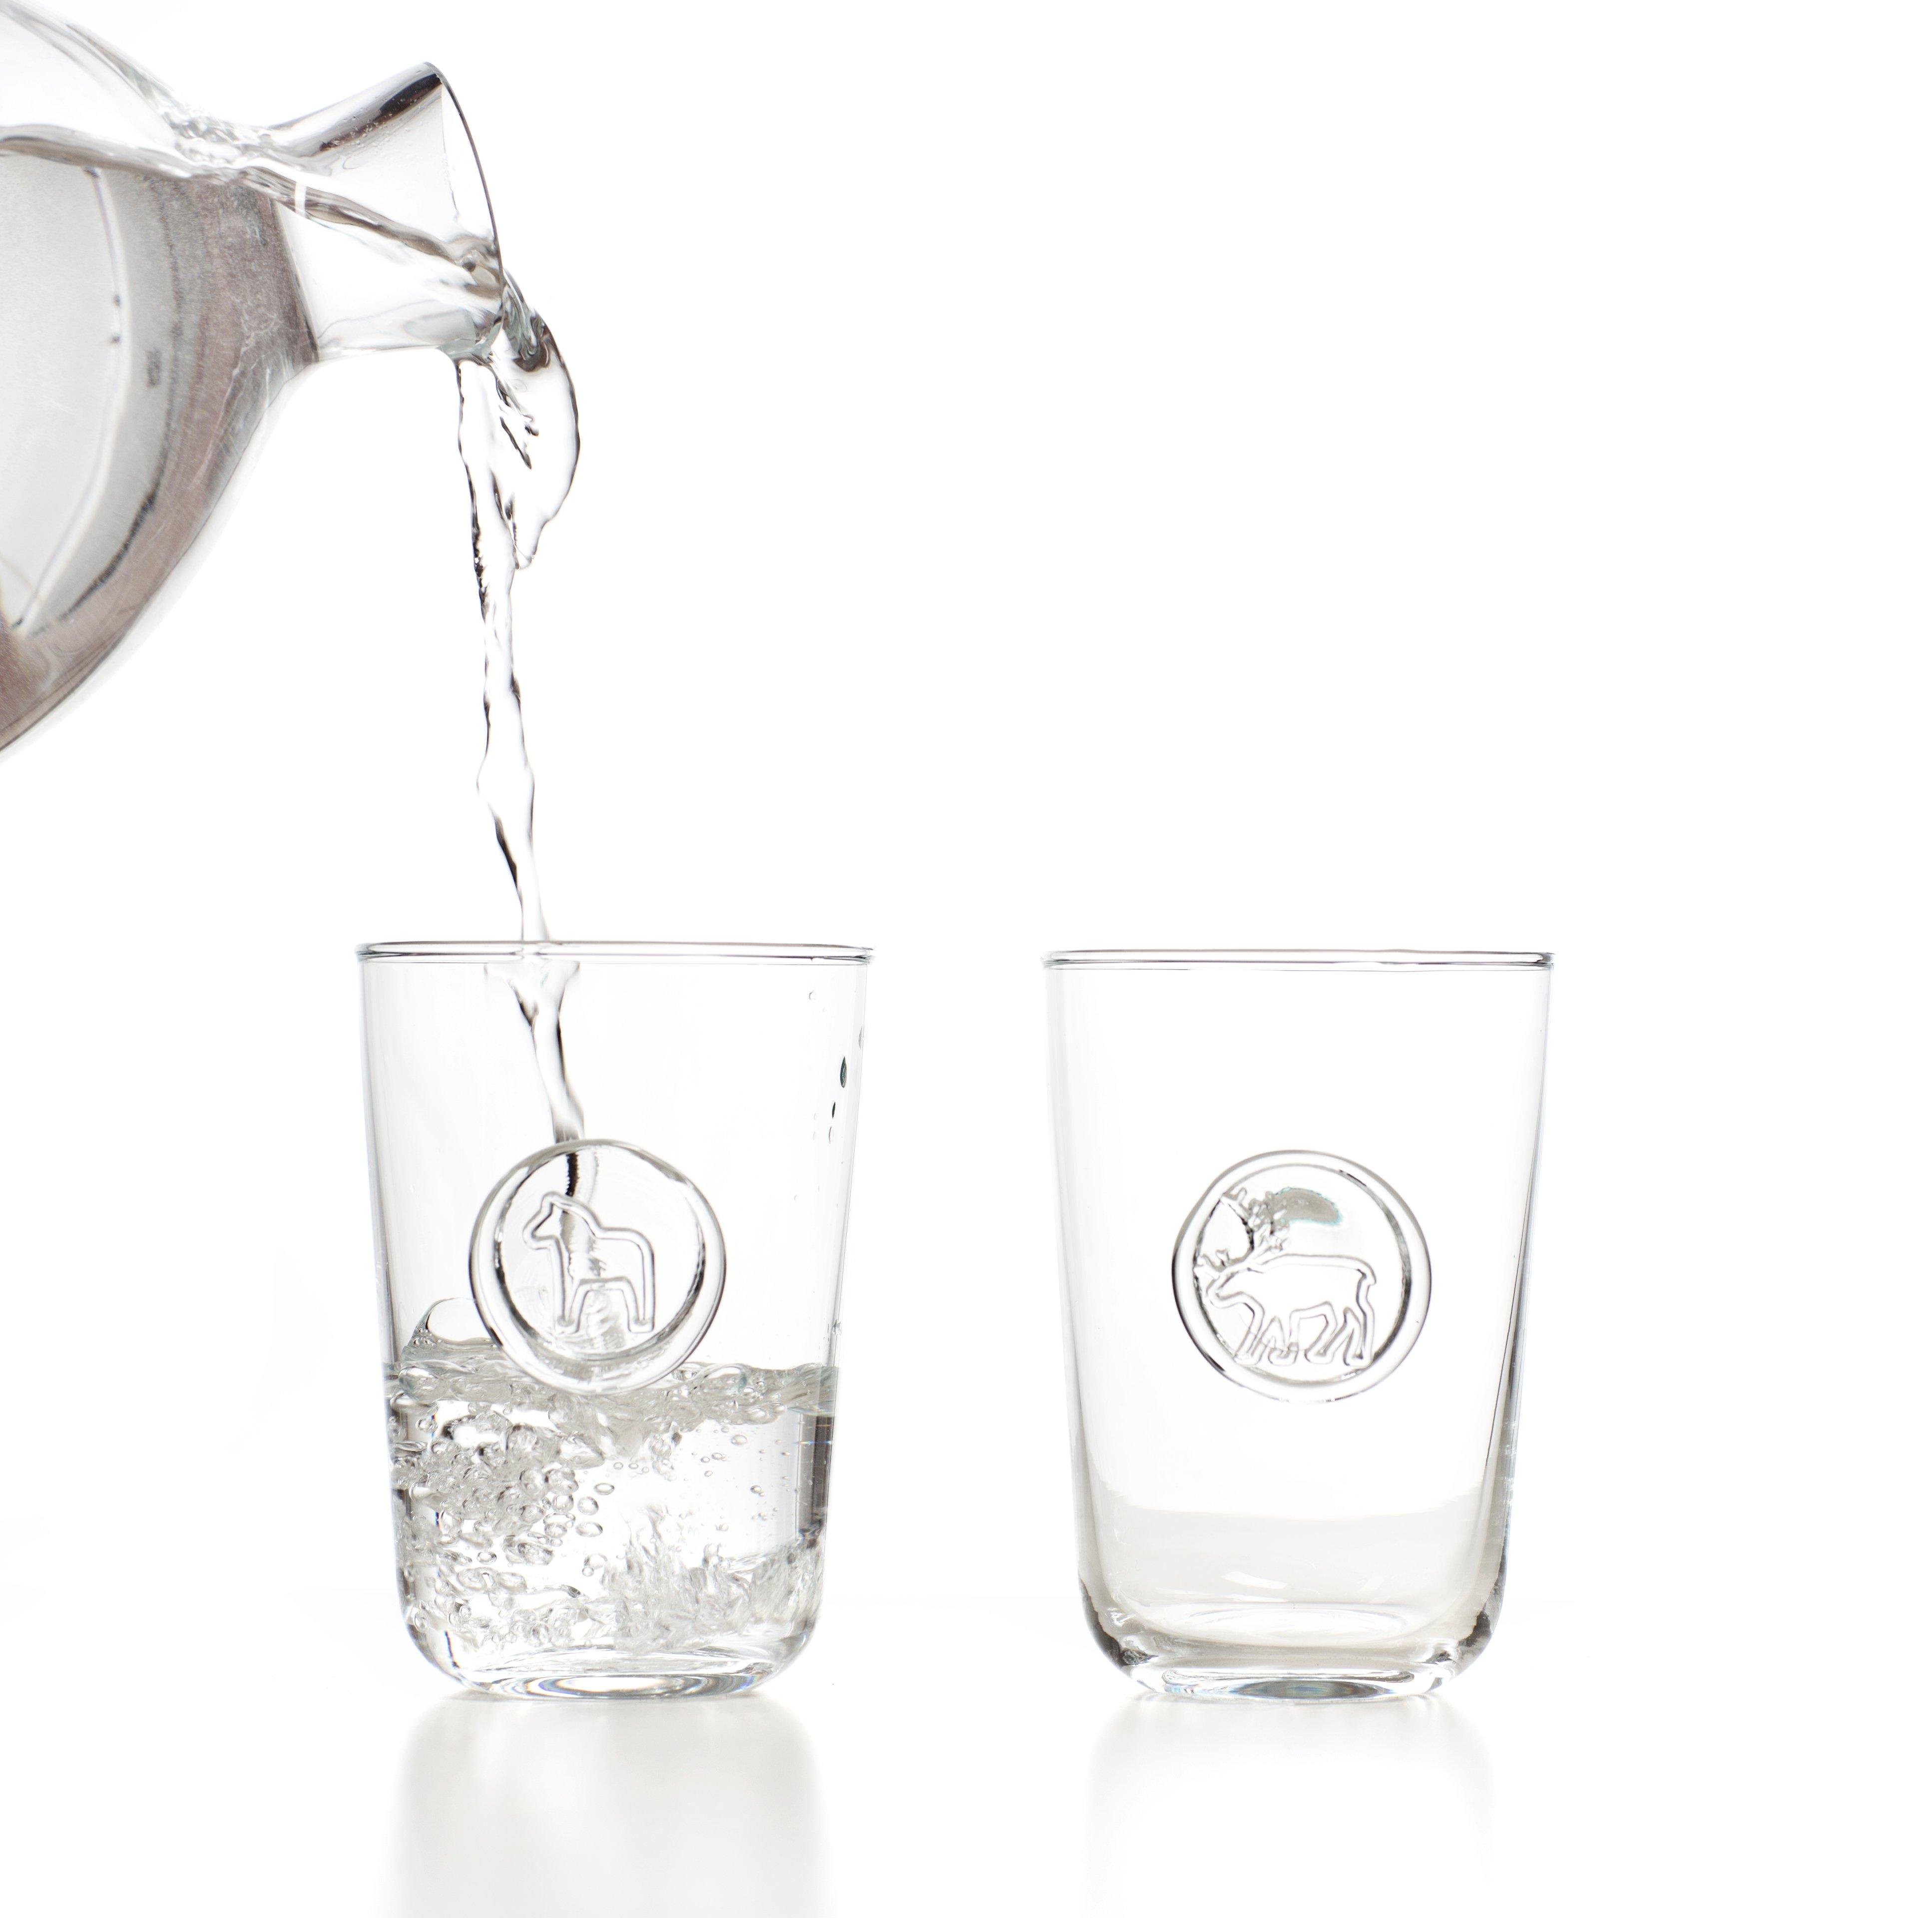 62977 GLAS REN/GLASE REINDEER